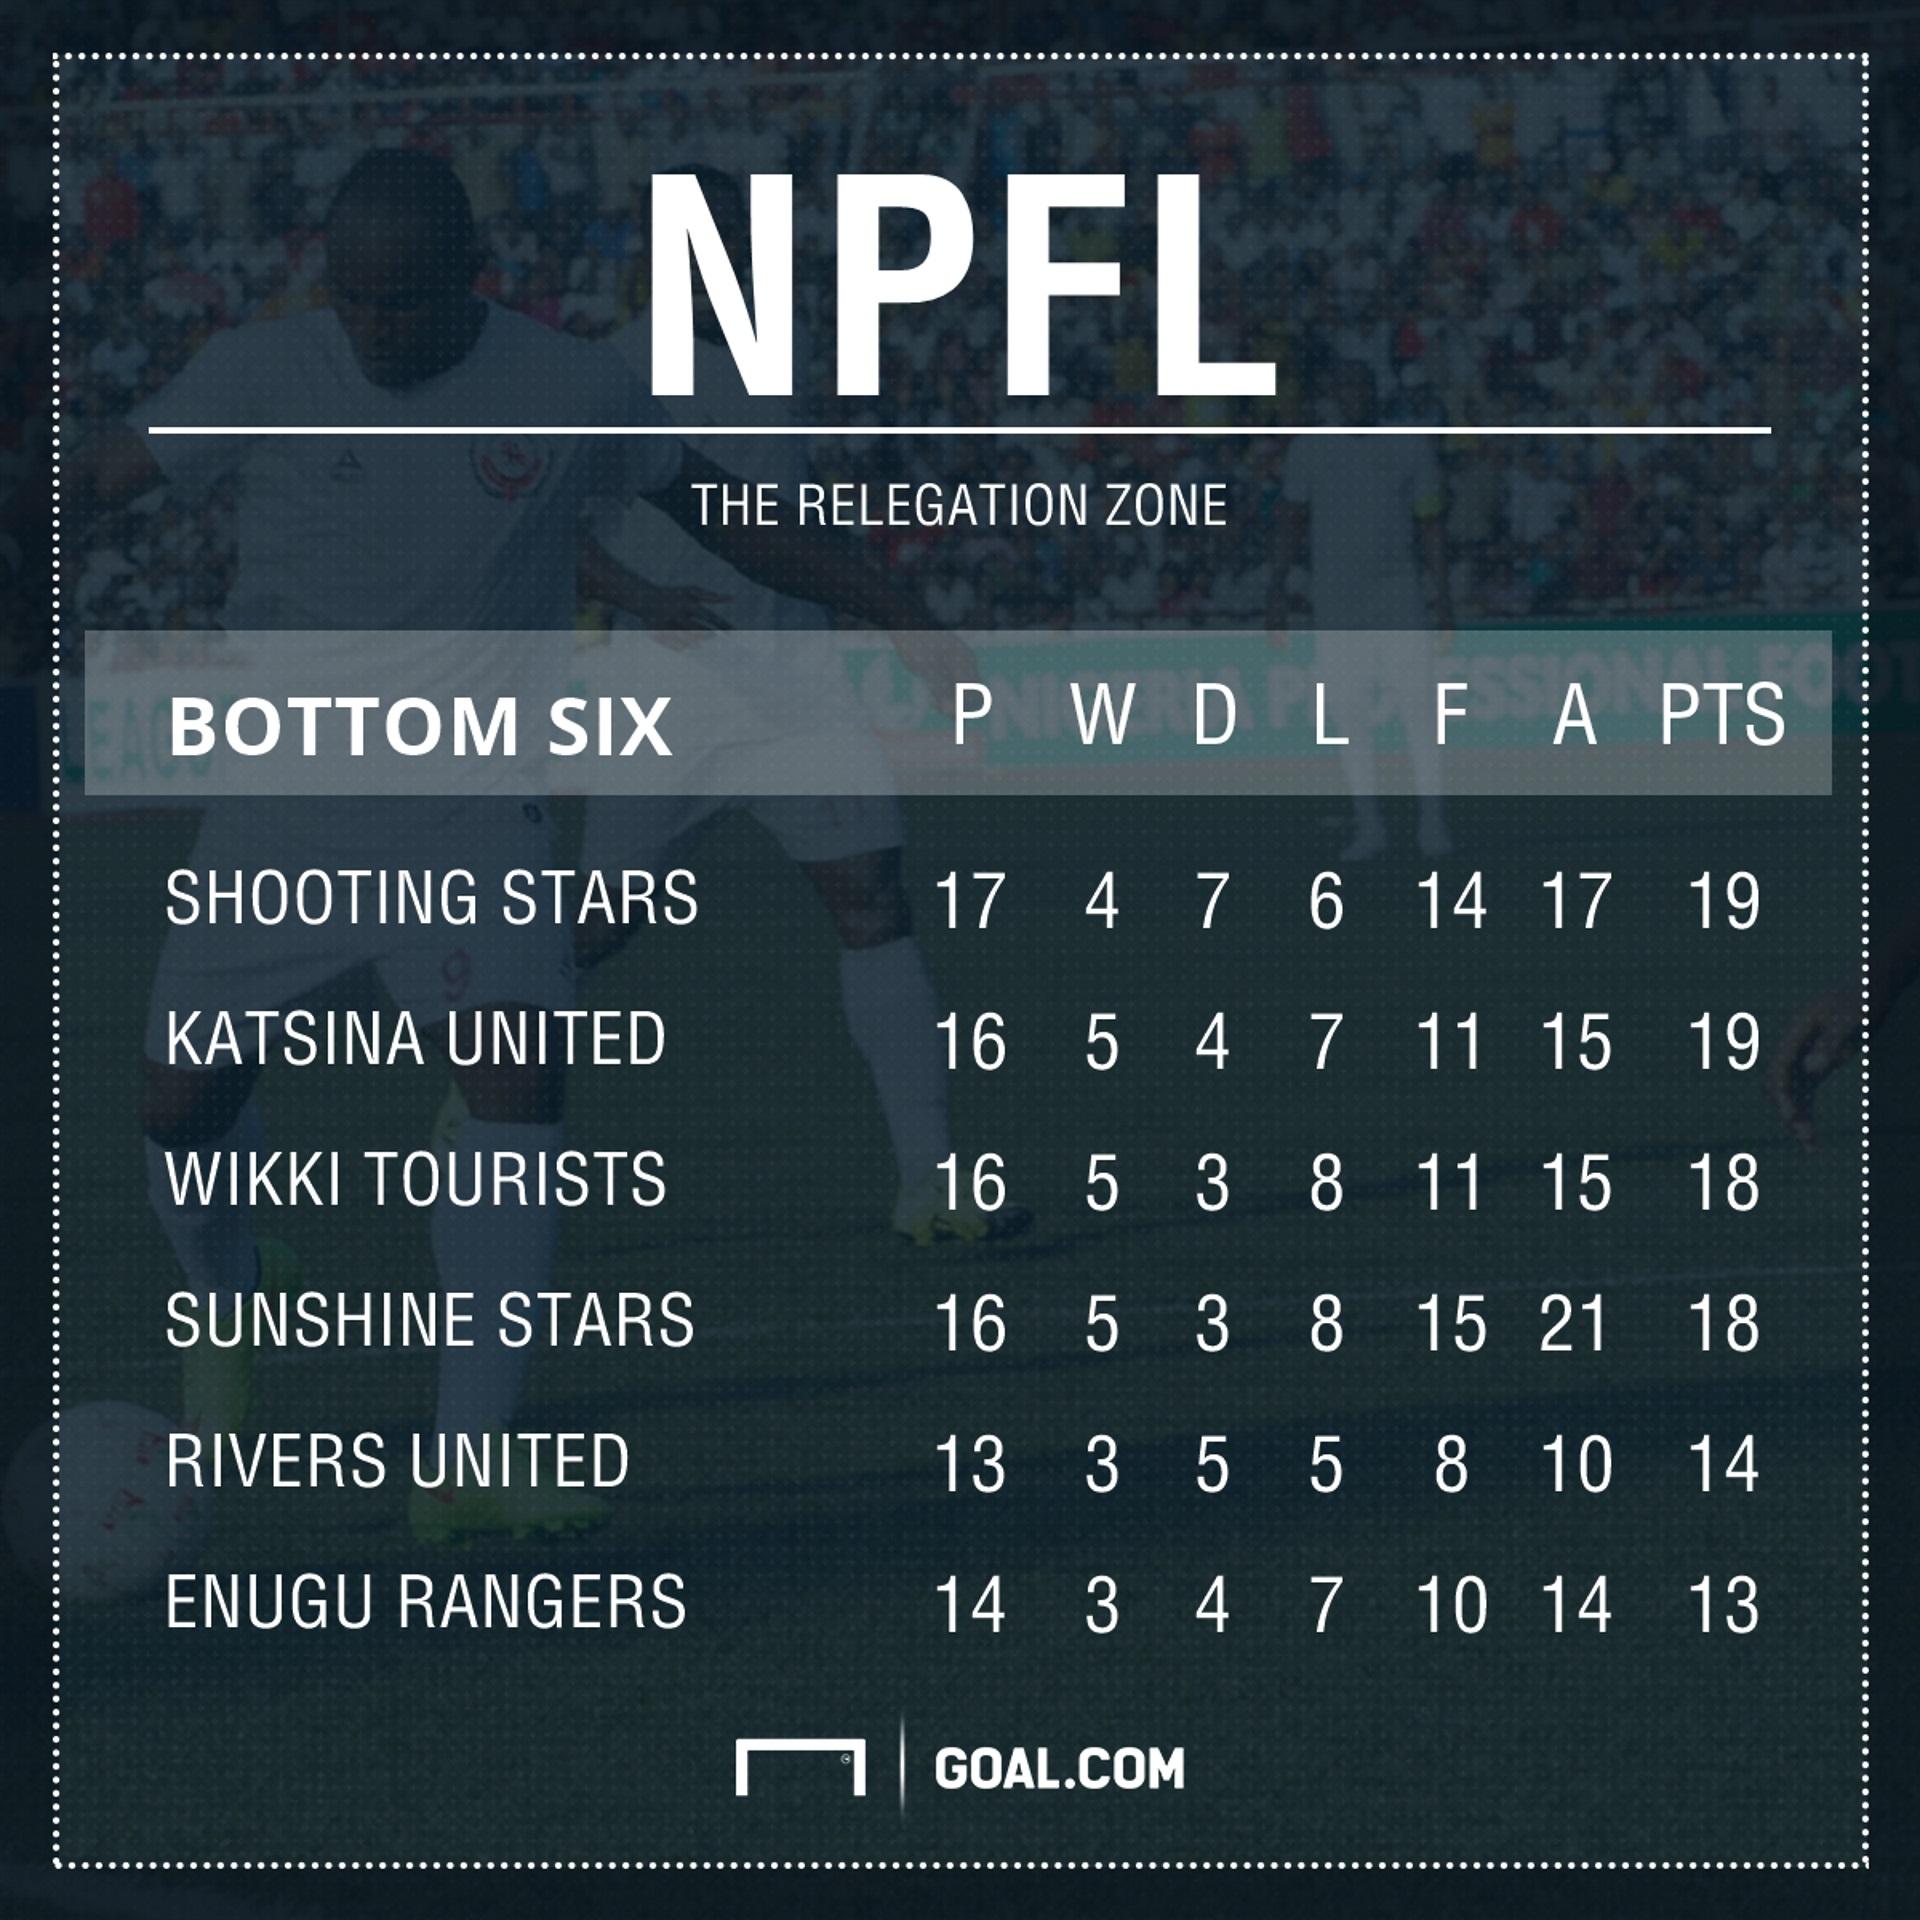 NPFL Relegation Zone